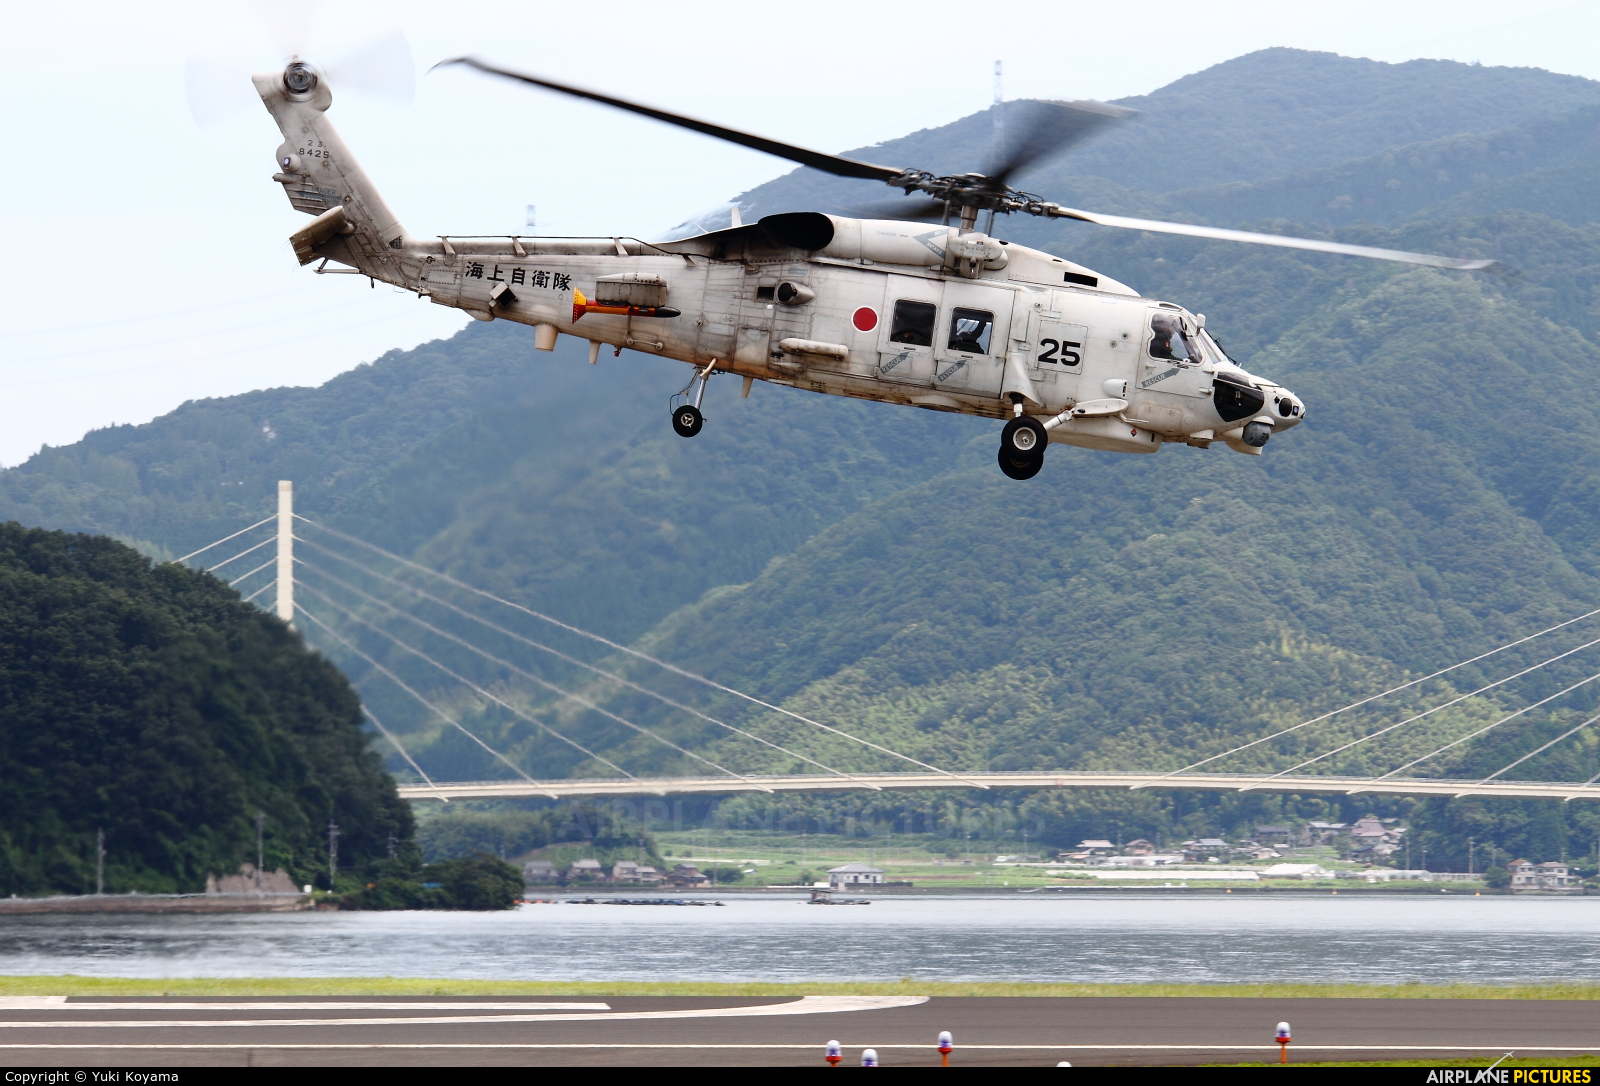 Japan - Maritime Self-Defense Force 8425 aircraft at Maizuru Air Station